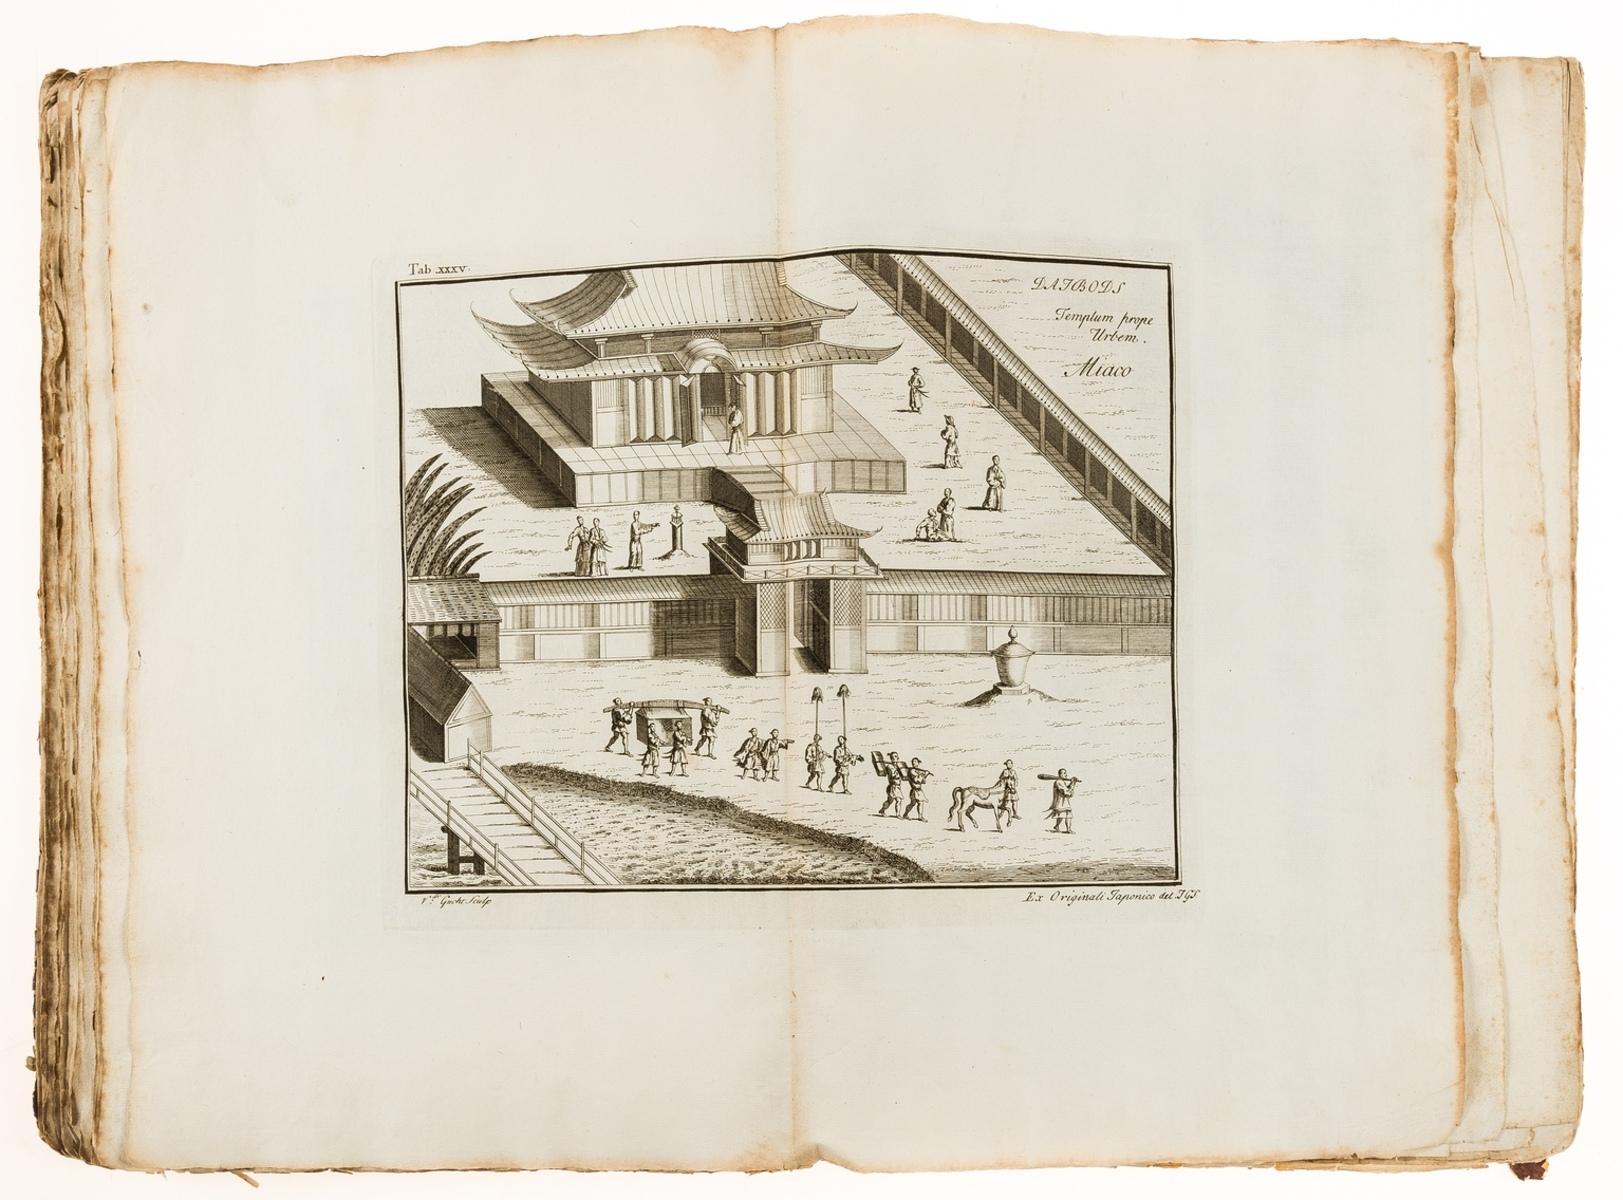 Japan.- Kaempfer (Englebert) Historia Imperii Japonici [The History of Japan], translated by J. … - Image 2 of 3